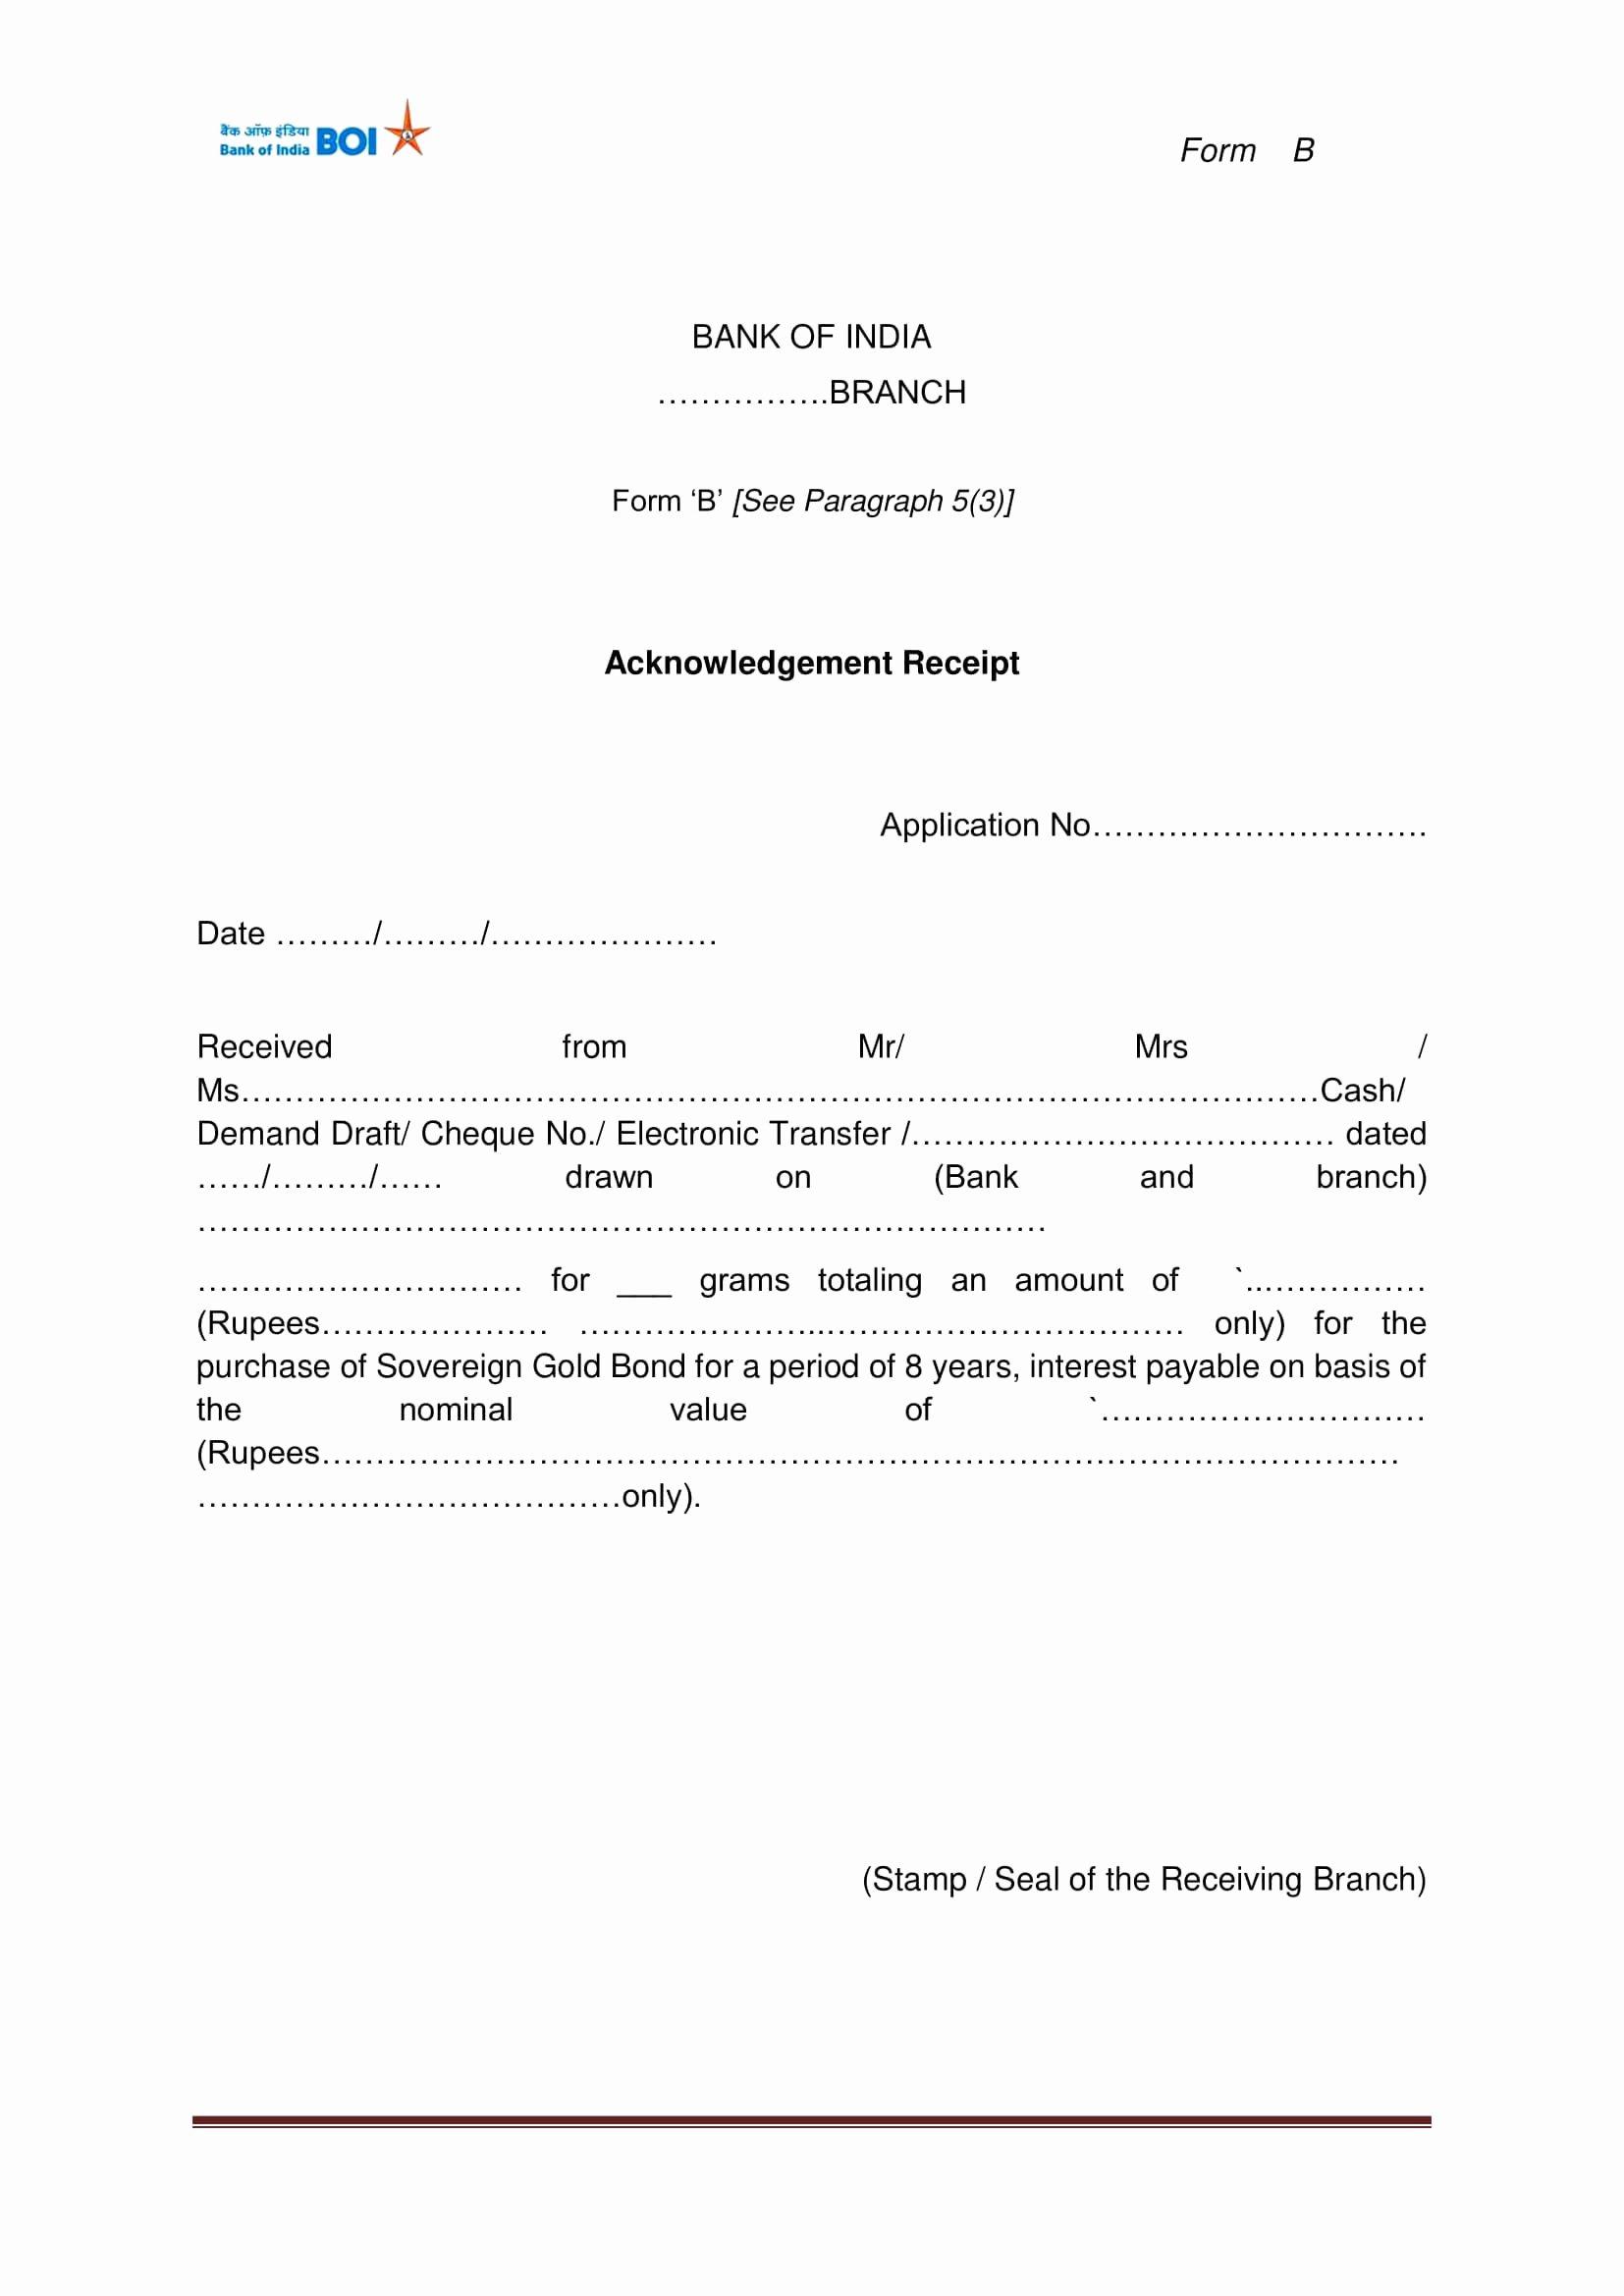 Acknowledgment Receipt Of Documents Luxury 9 Acknowledgment Receipt Examples Pdf